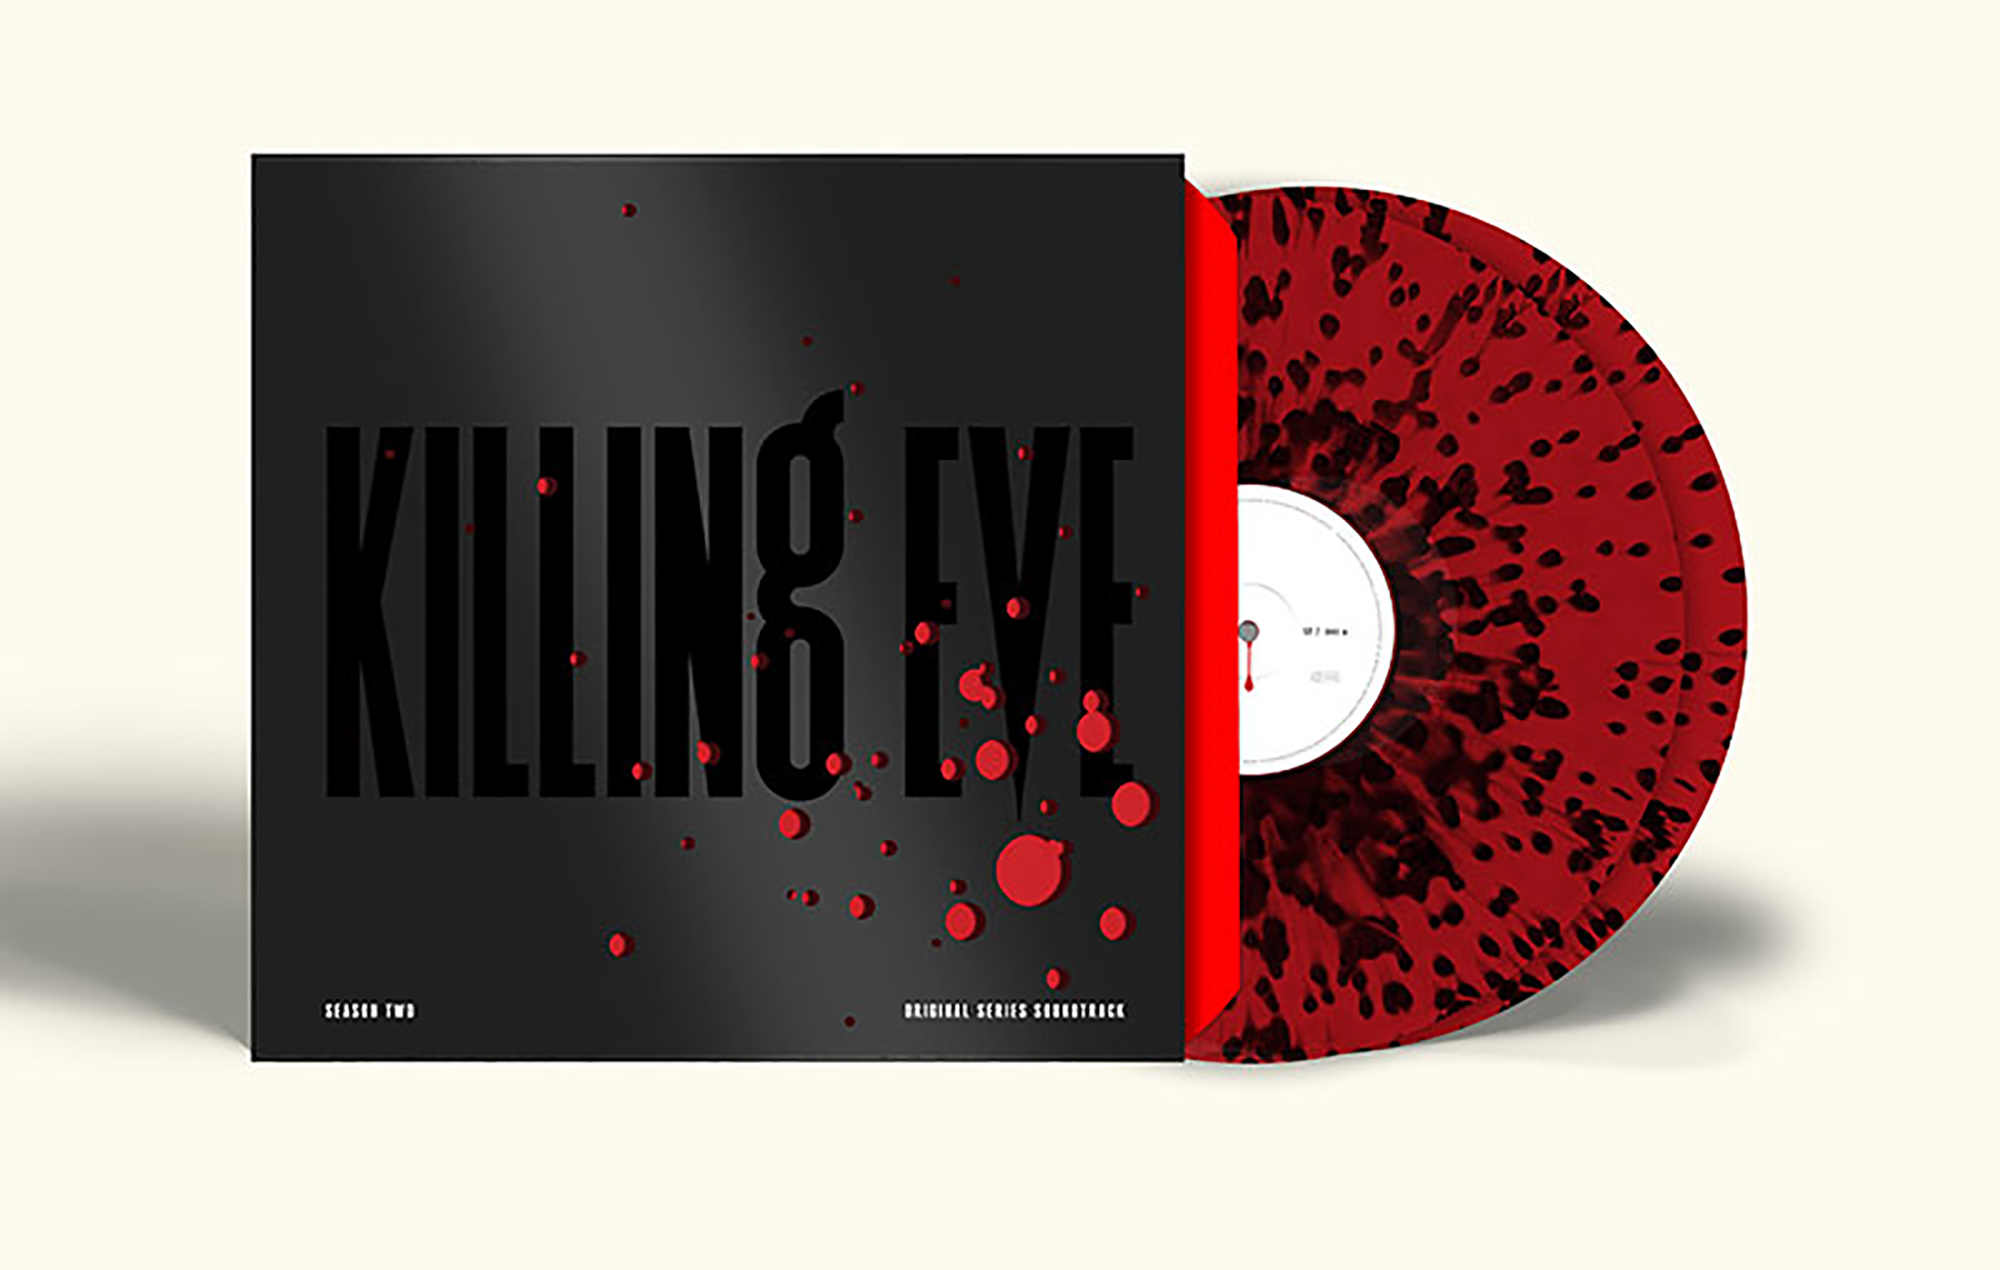 Killing Eve vinyl